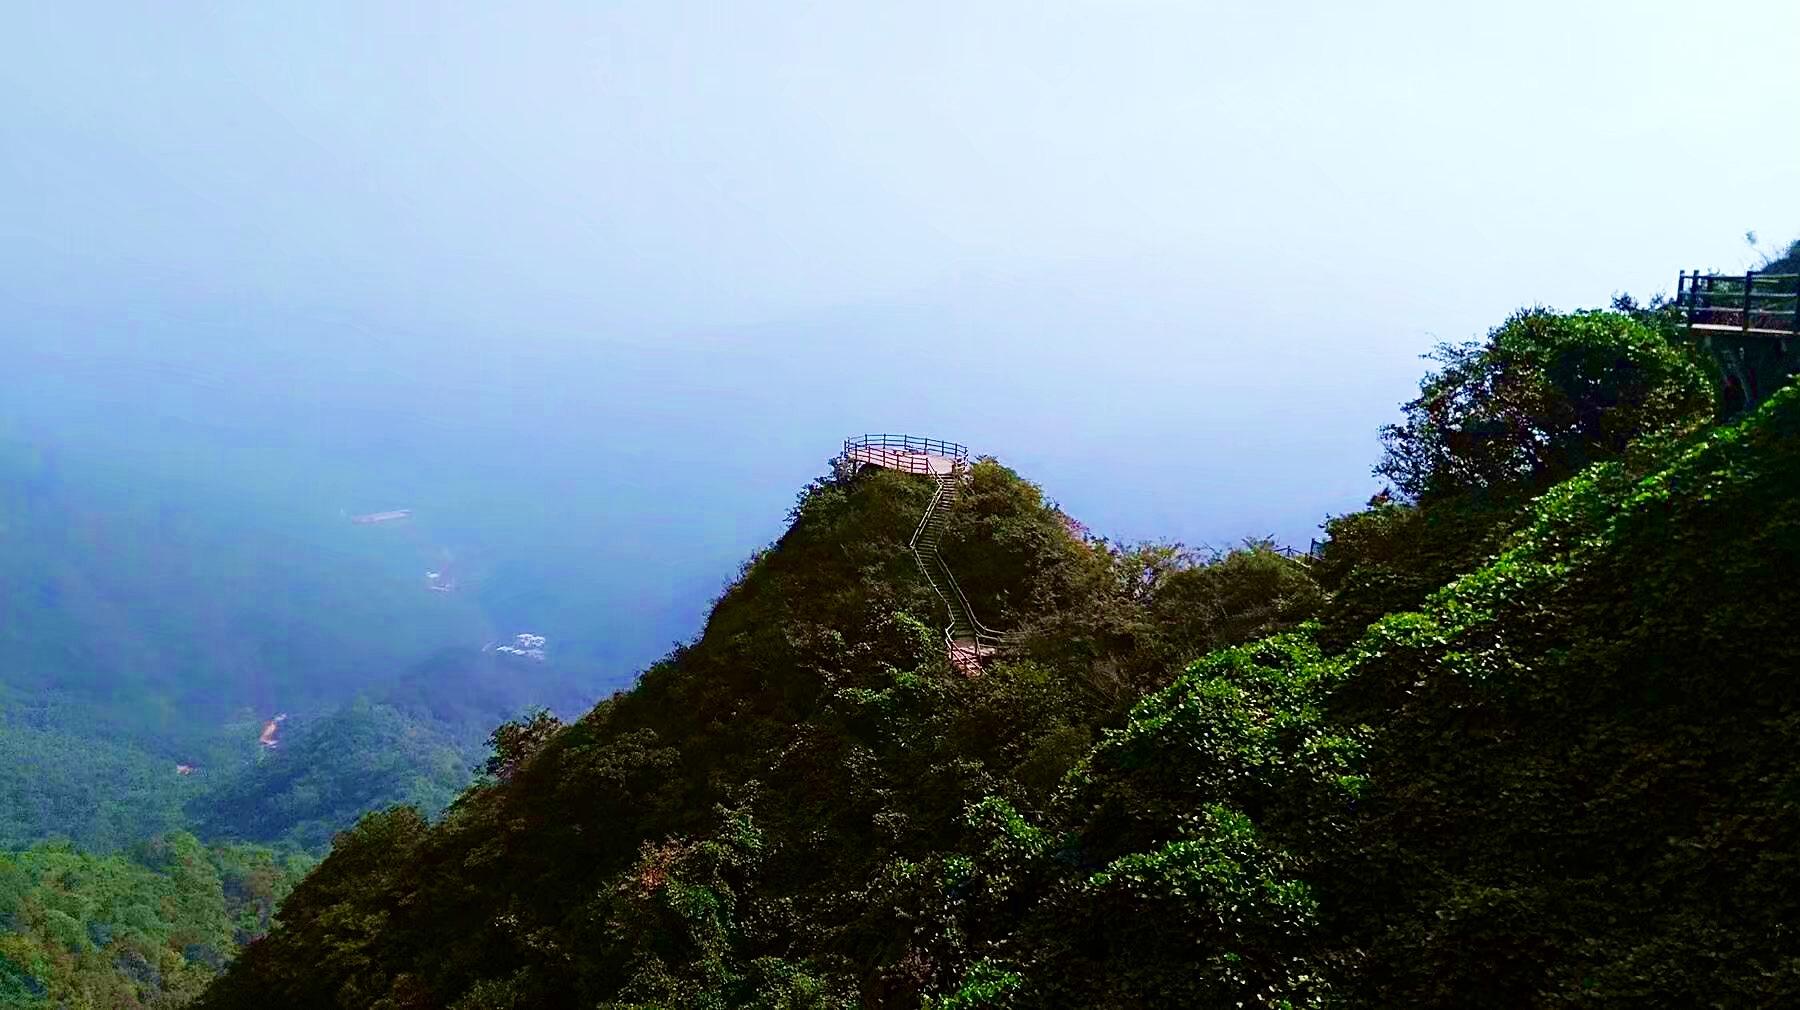 Qifeng Mountain Ecological Tourism Area